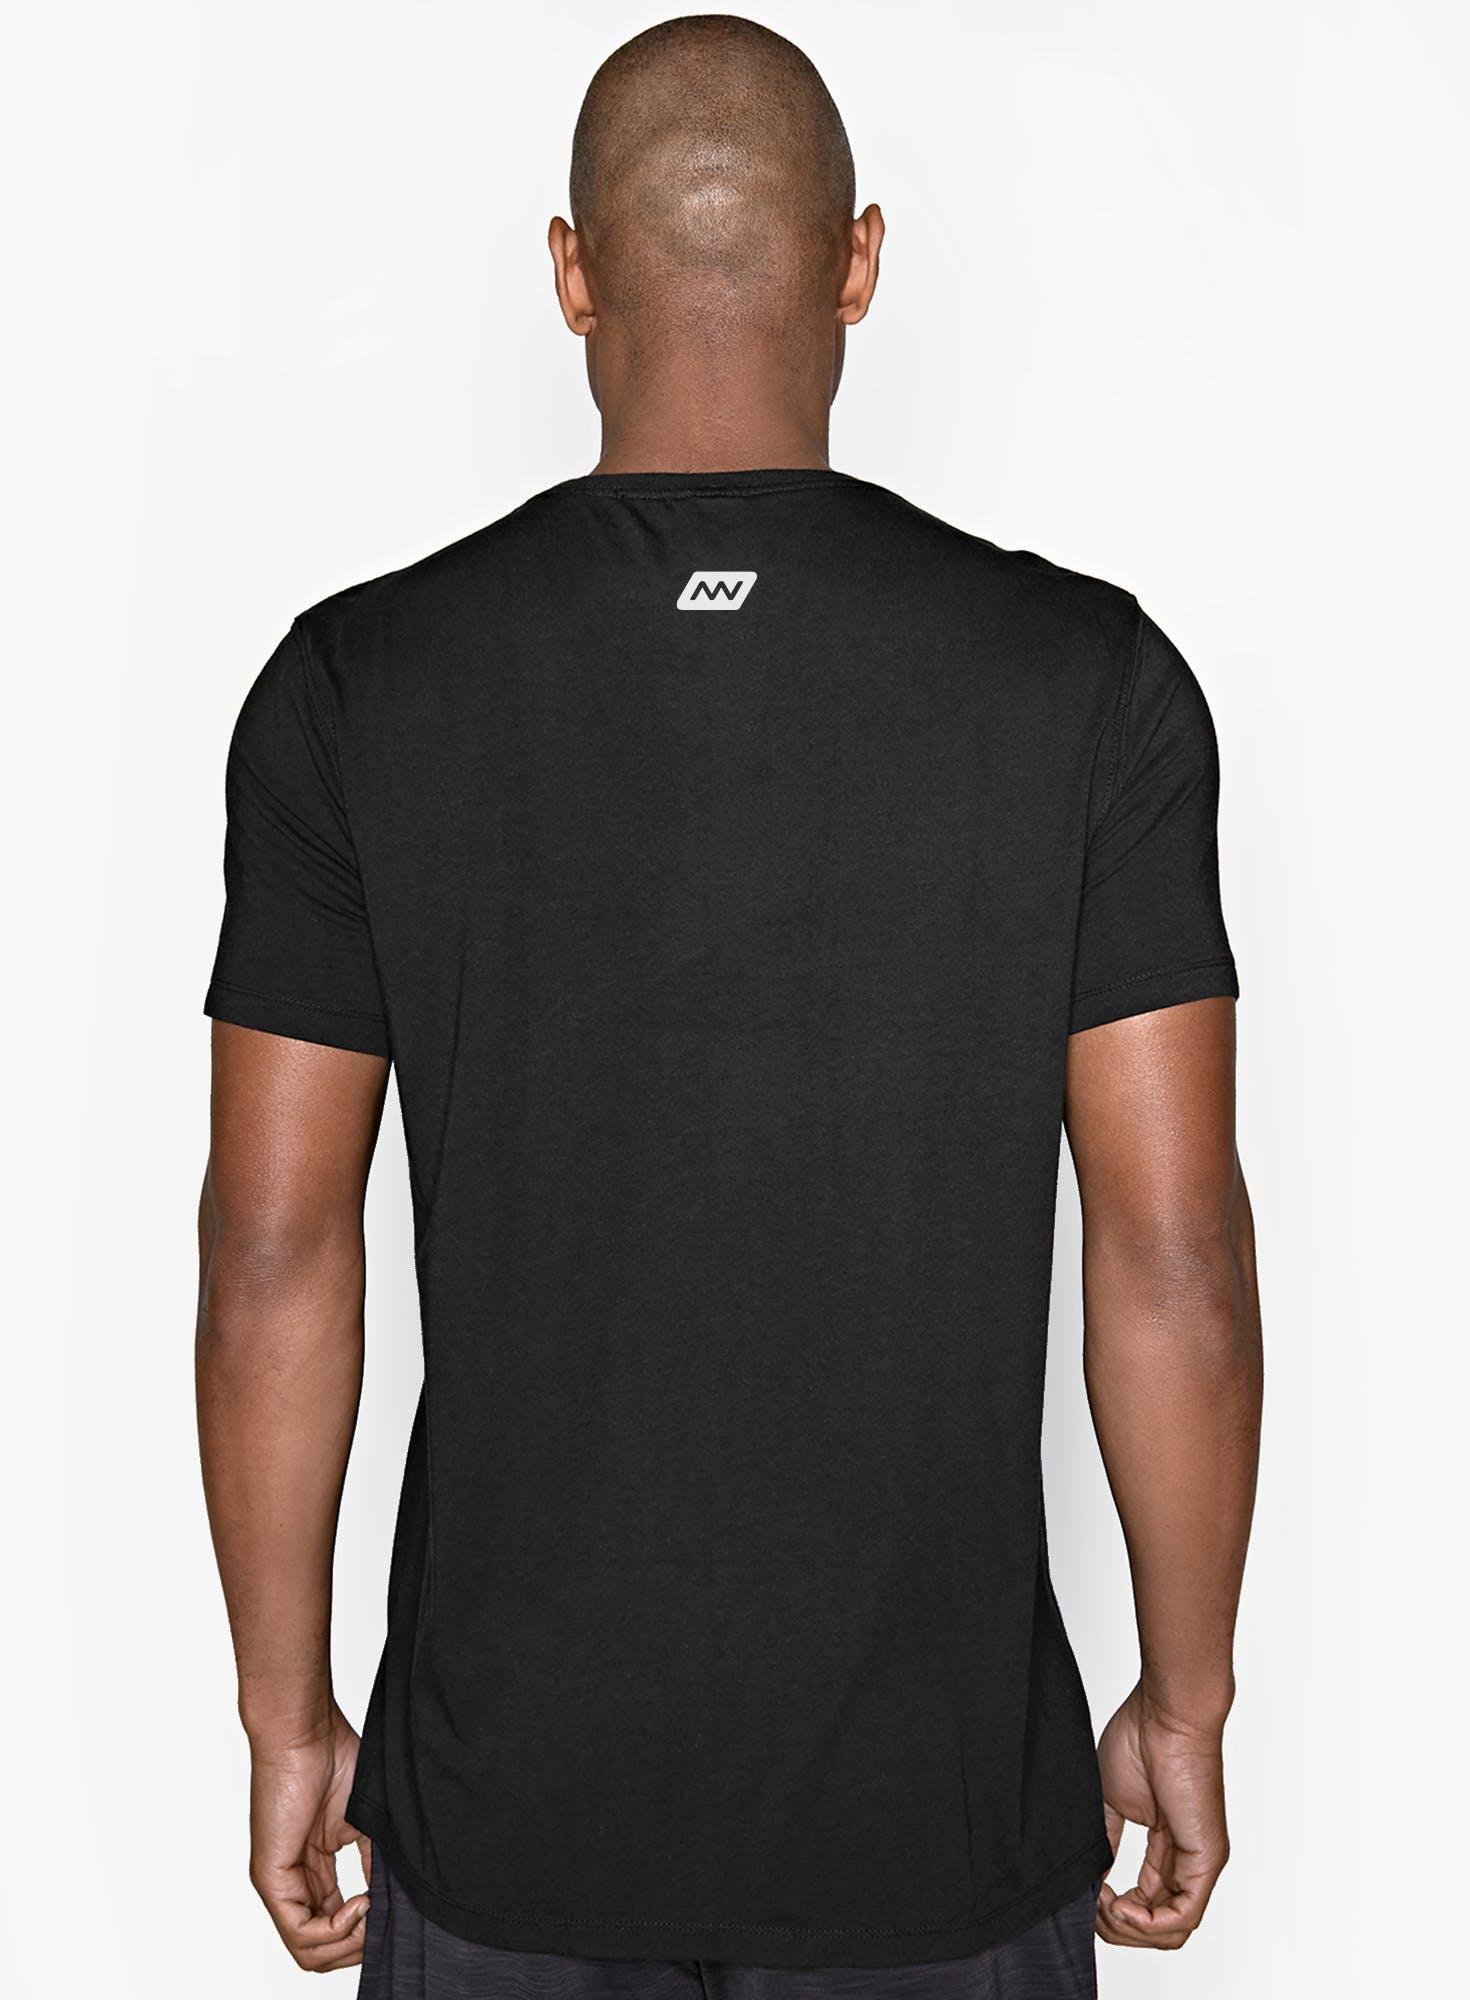 Onnit Type Bamboo T-Shirt Bonus Image